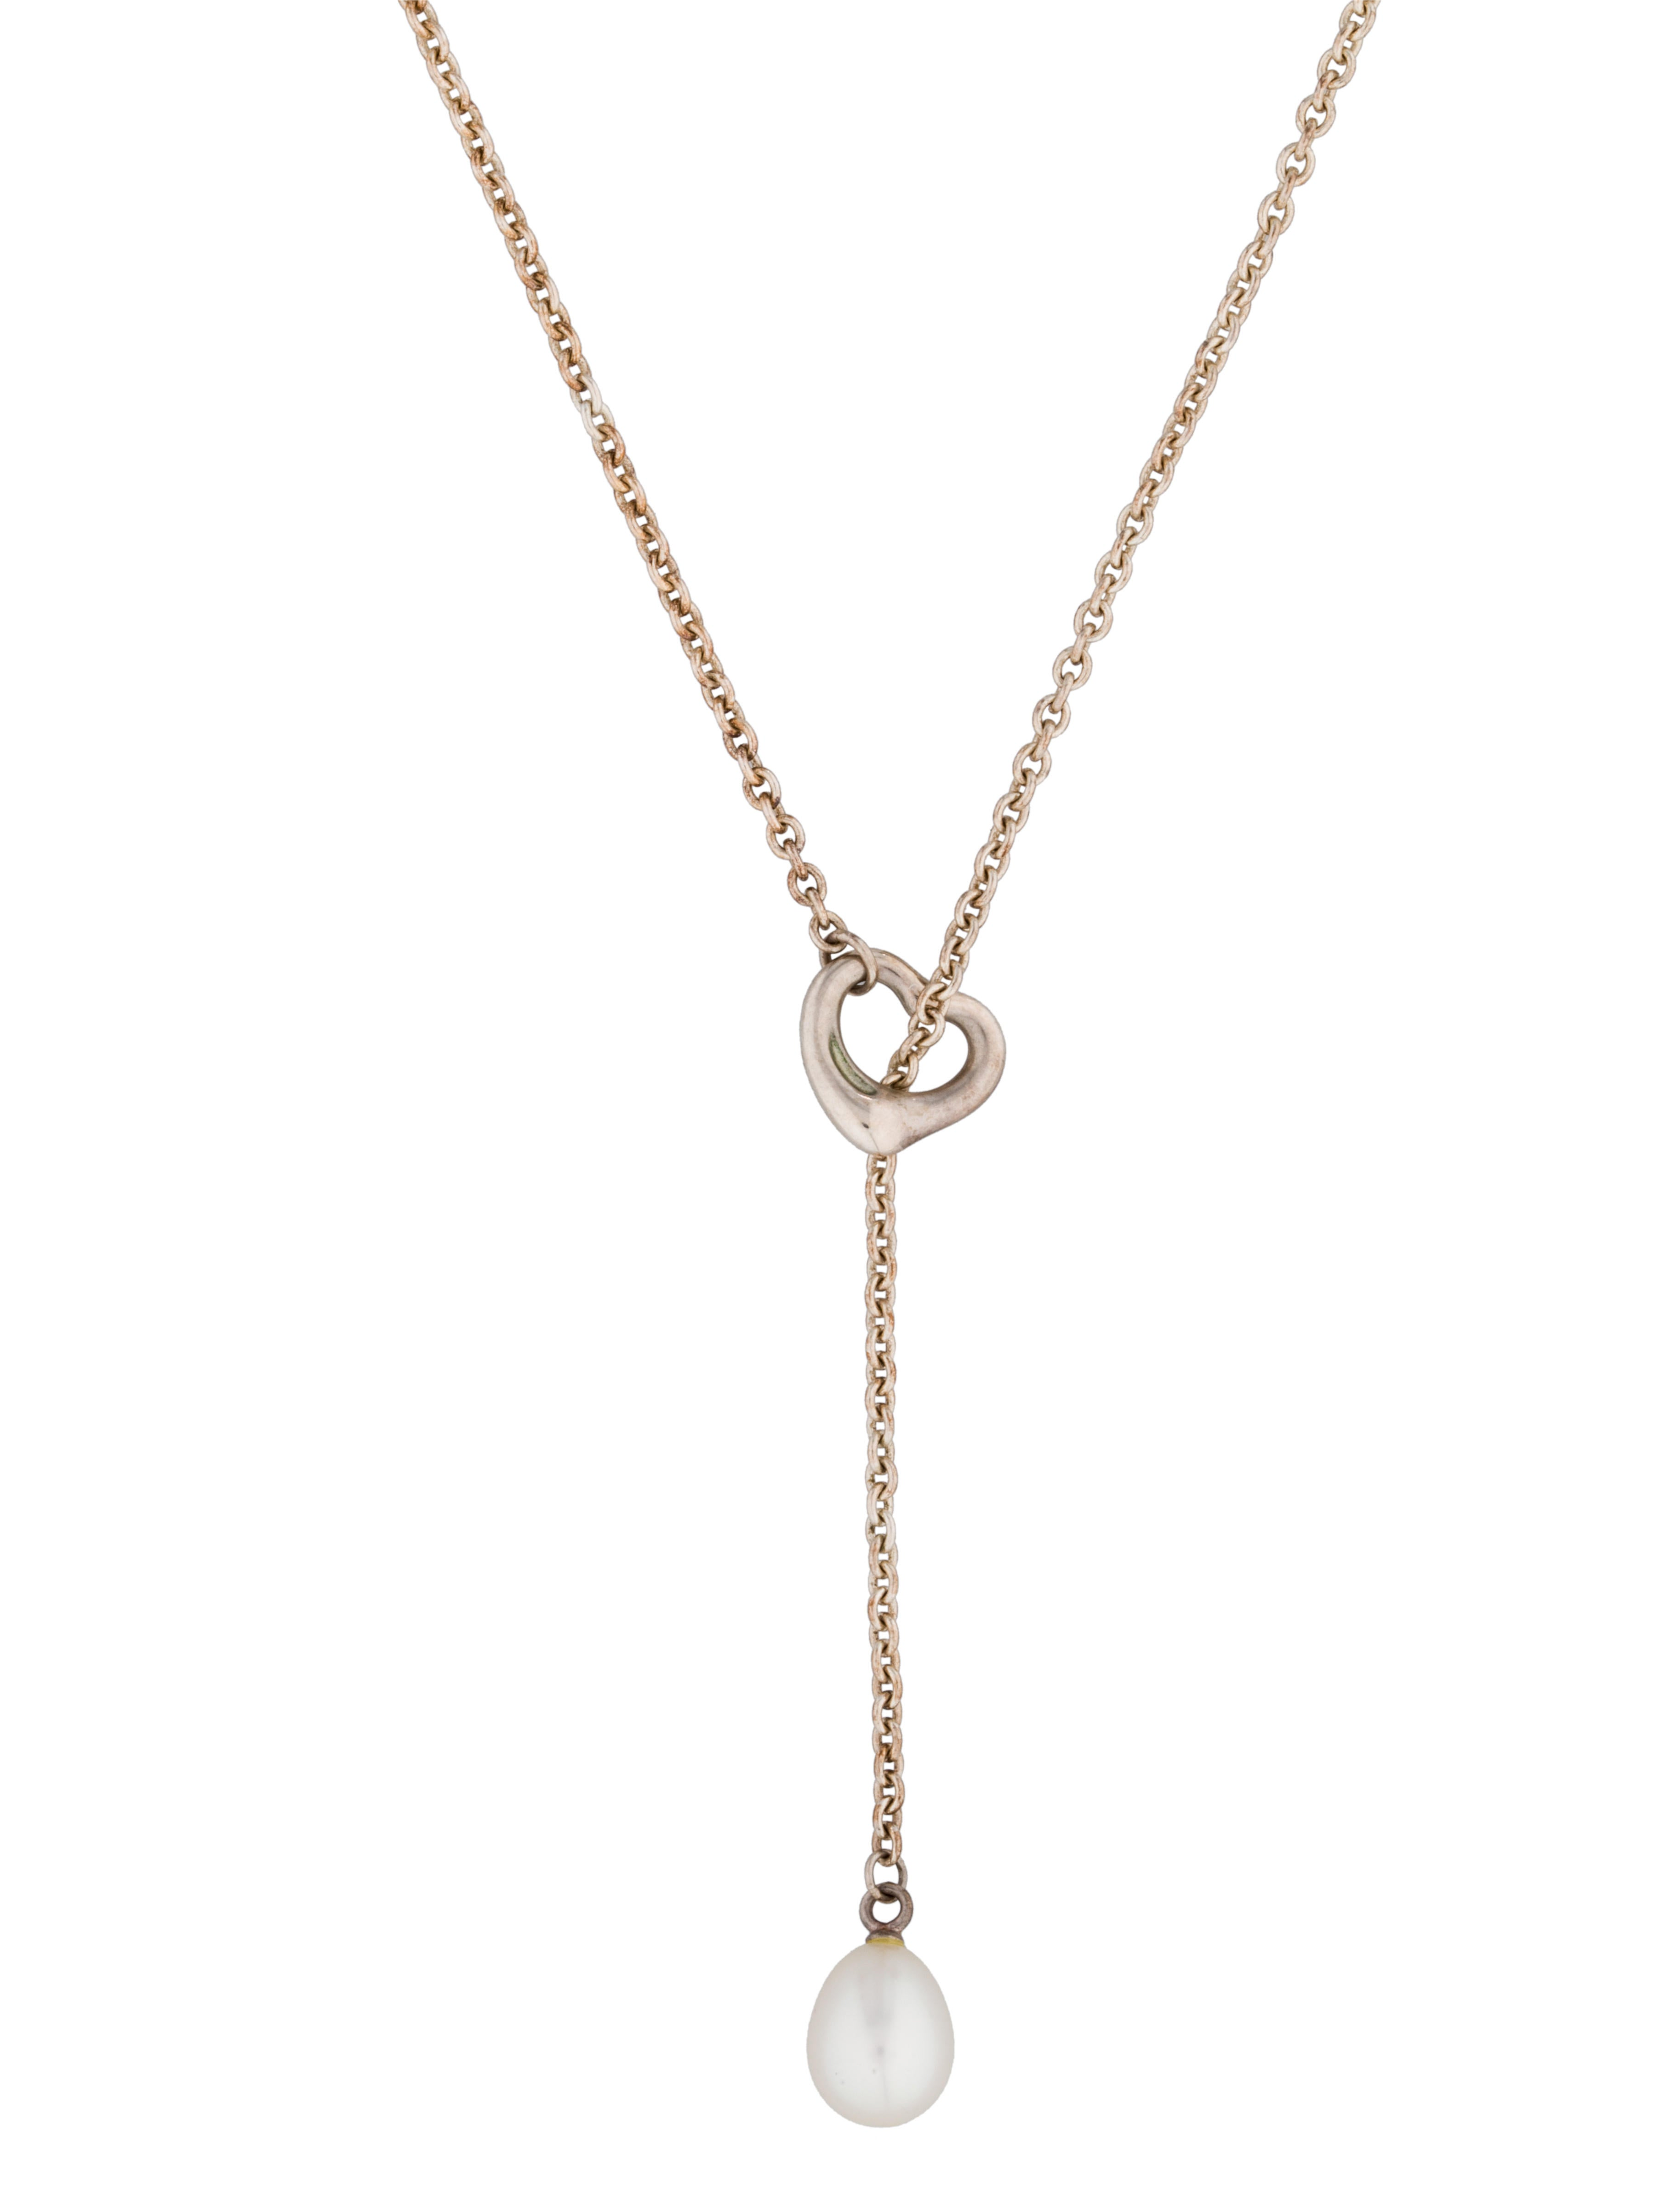 Tiffany co elsa peretti open heart lariat necklace necklaces elsa peretti open heart lariat necklace aloadofball Images